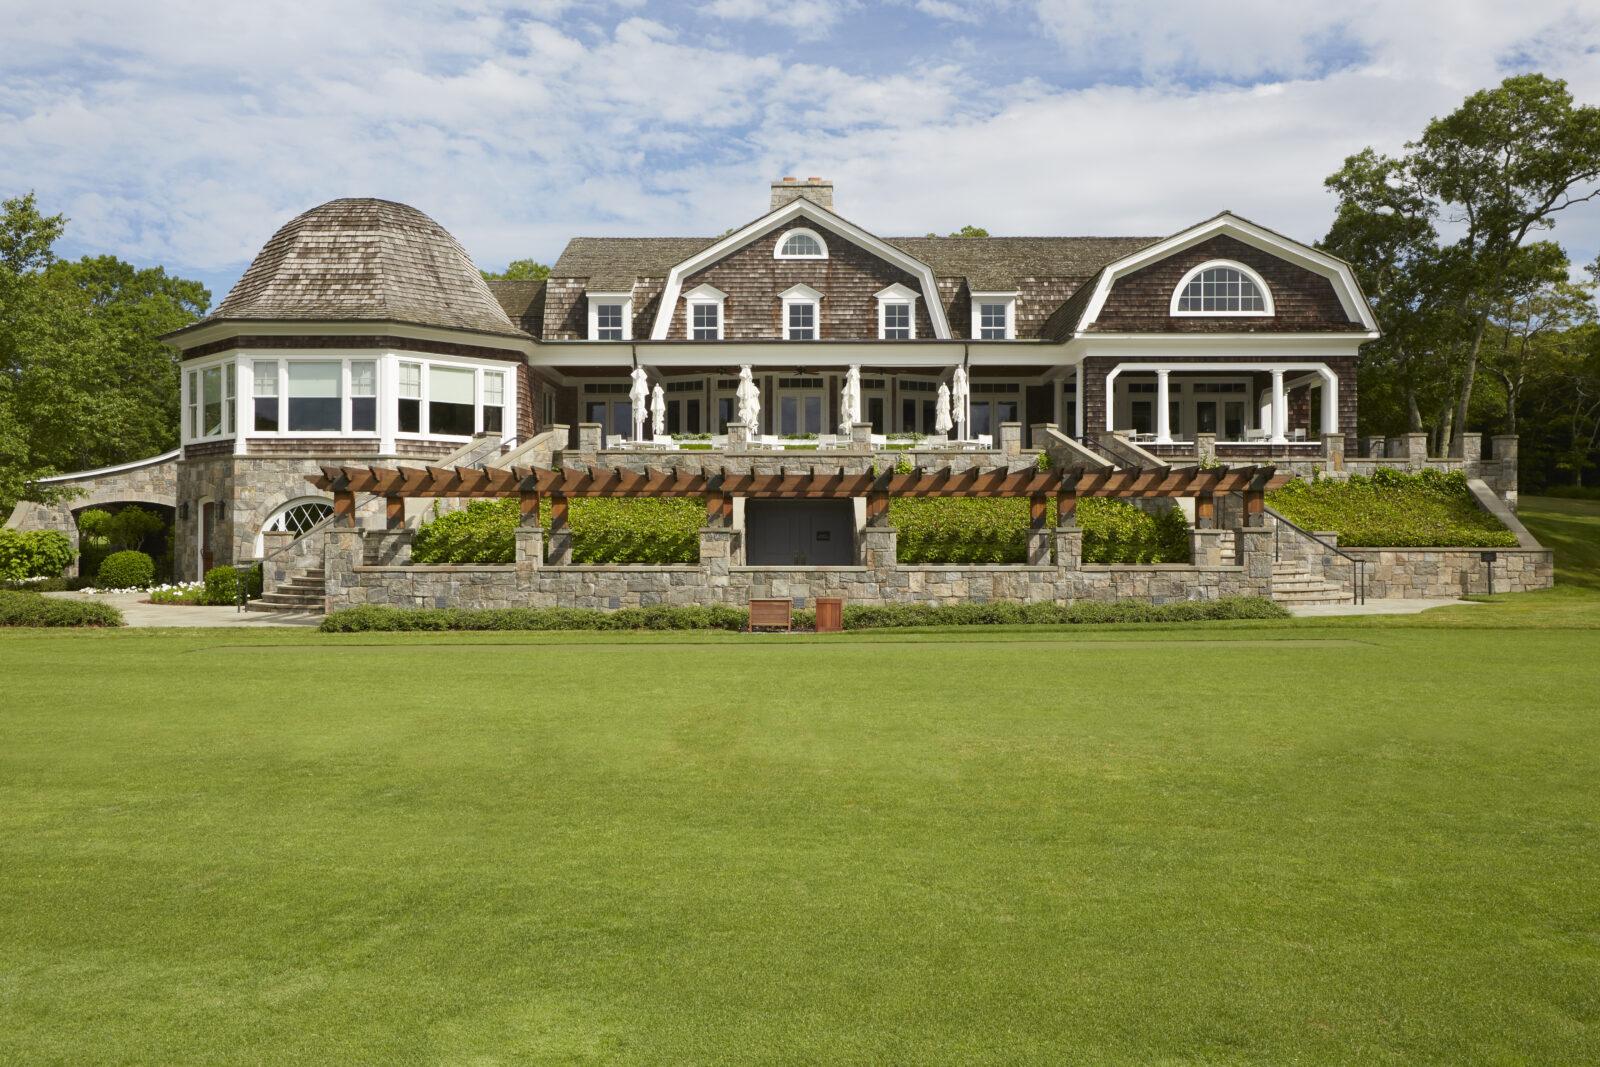 east hampton golf club shingle style architecture